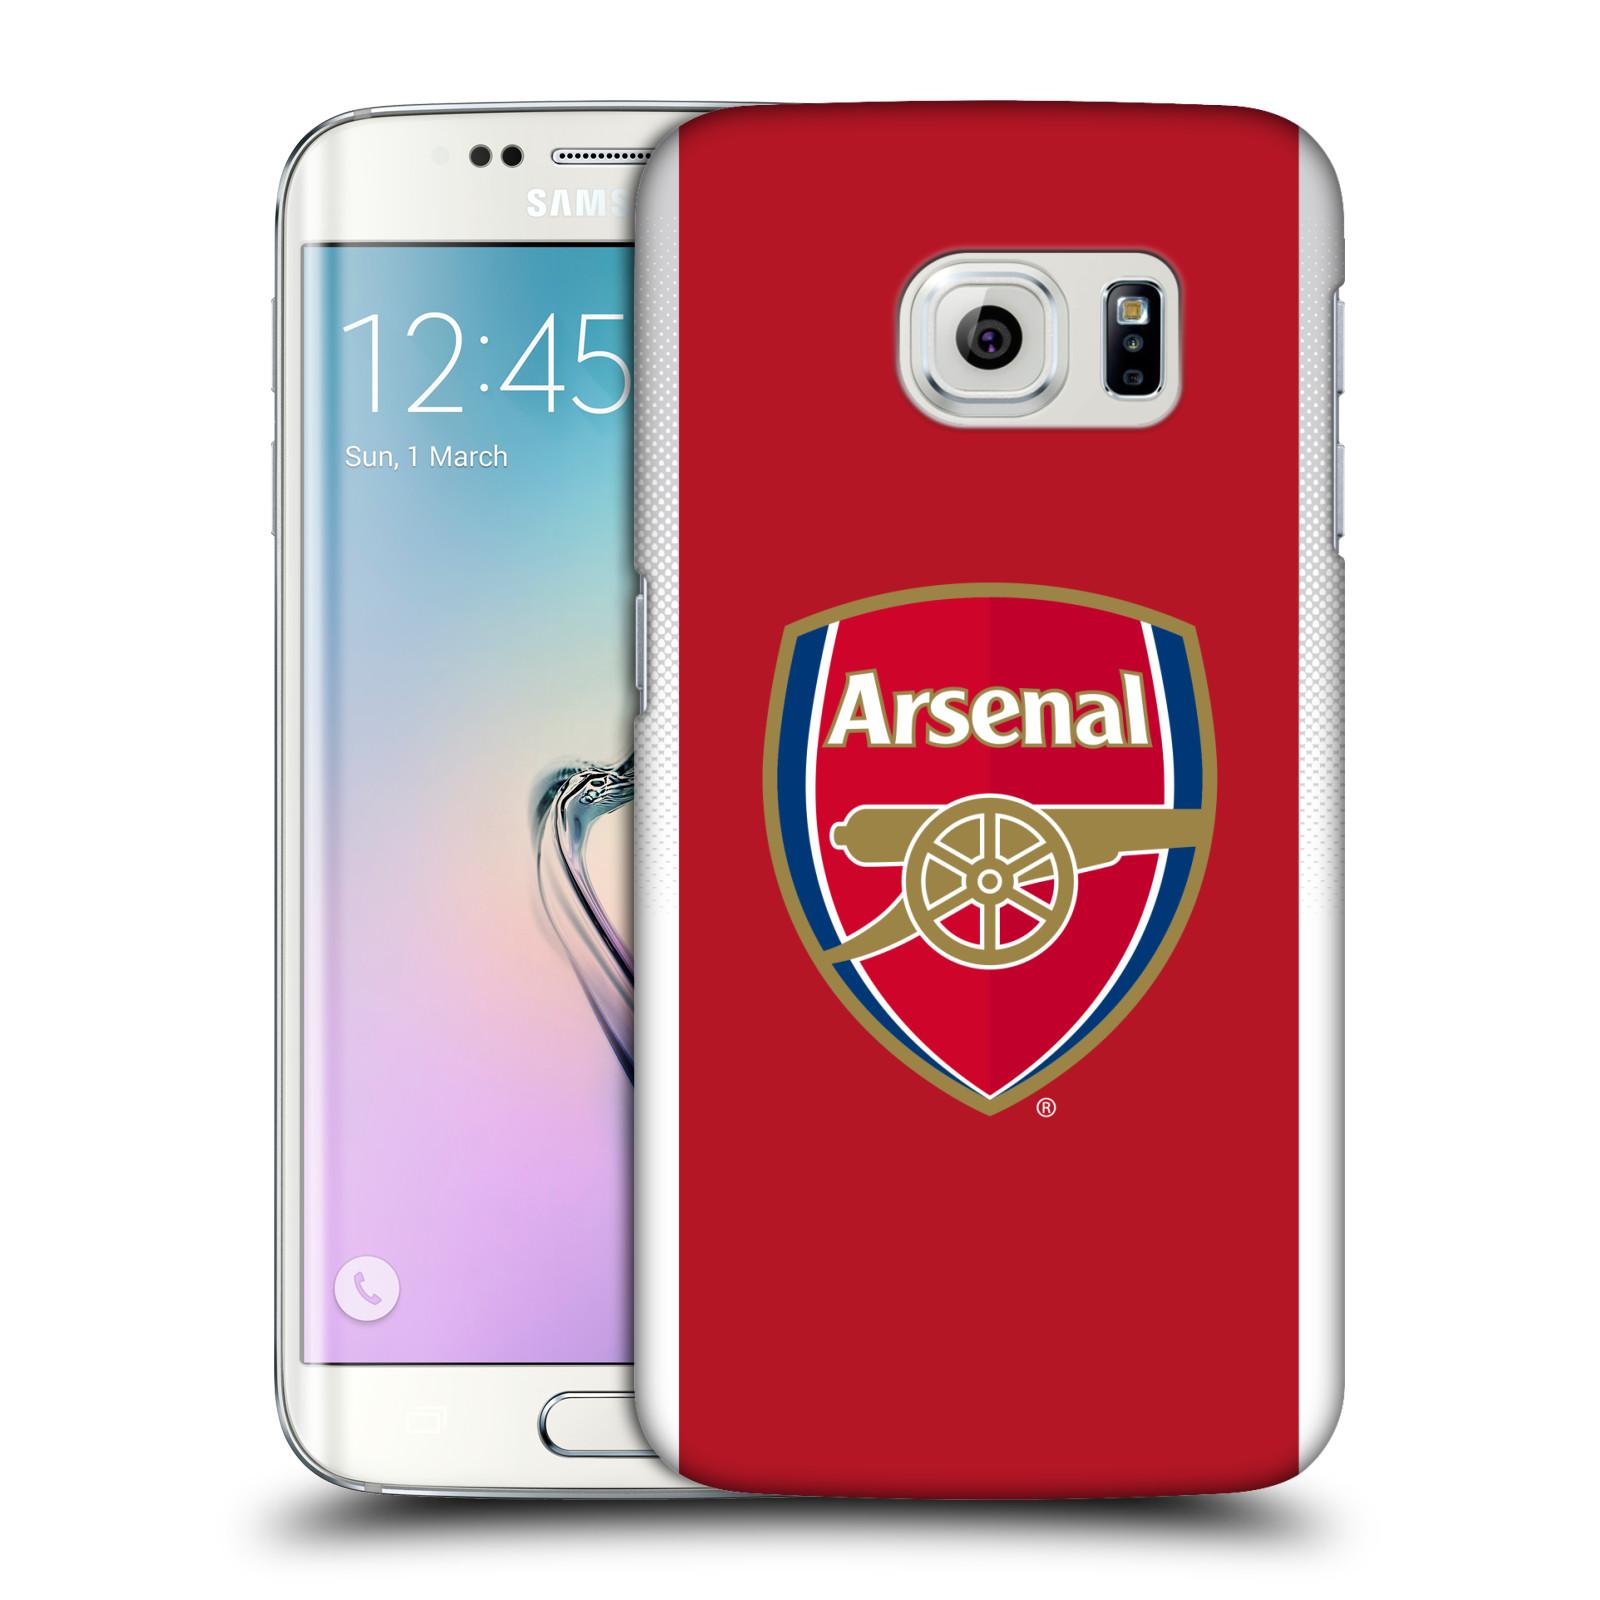 Plastové pouzdro na mobil Samsung Galaxy S6 Edge - Head Case - Arsenal FC - Logo klubu